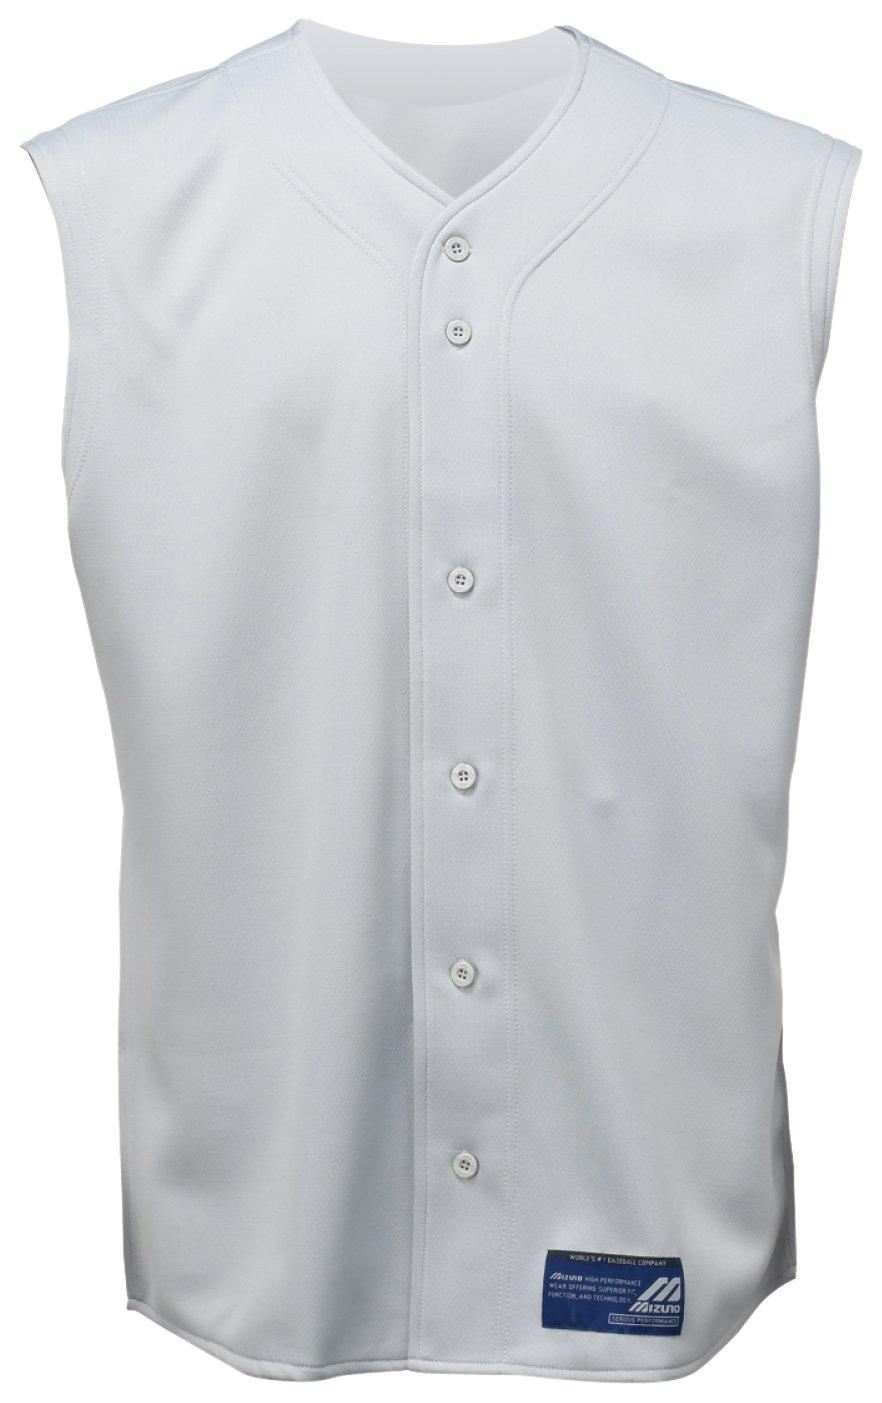 Mizuno Boy's Full Button Sleeveless Baseball Jersey, Grey, Small 350125.9191.04.S 0-3231